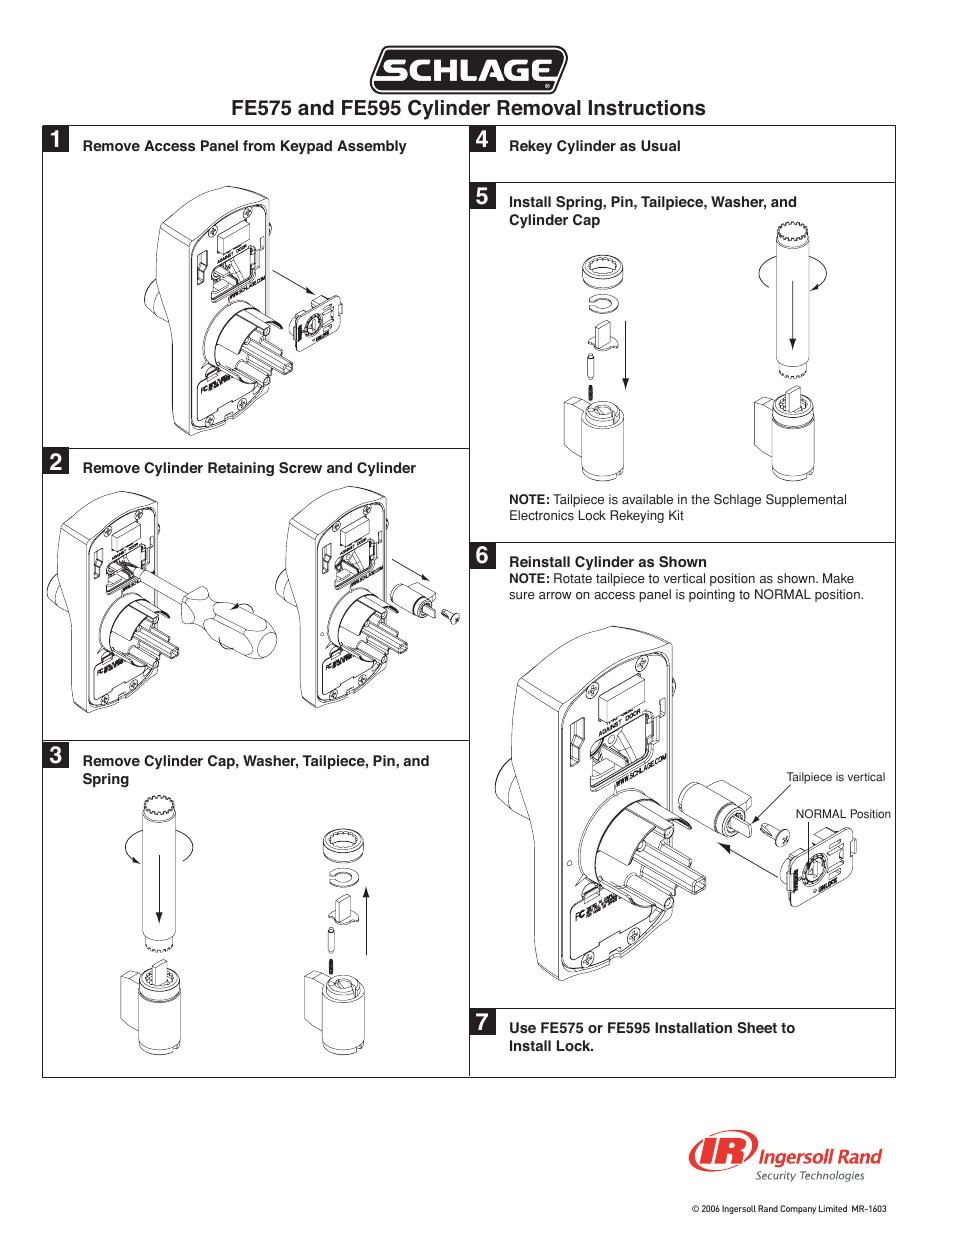 hight resolution of schlage parts diagram wiring diagram yer schlage fe595 parts diagram schlage fe595 parts diagram